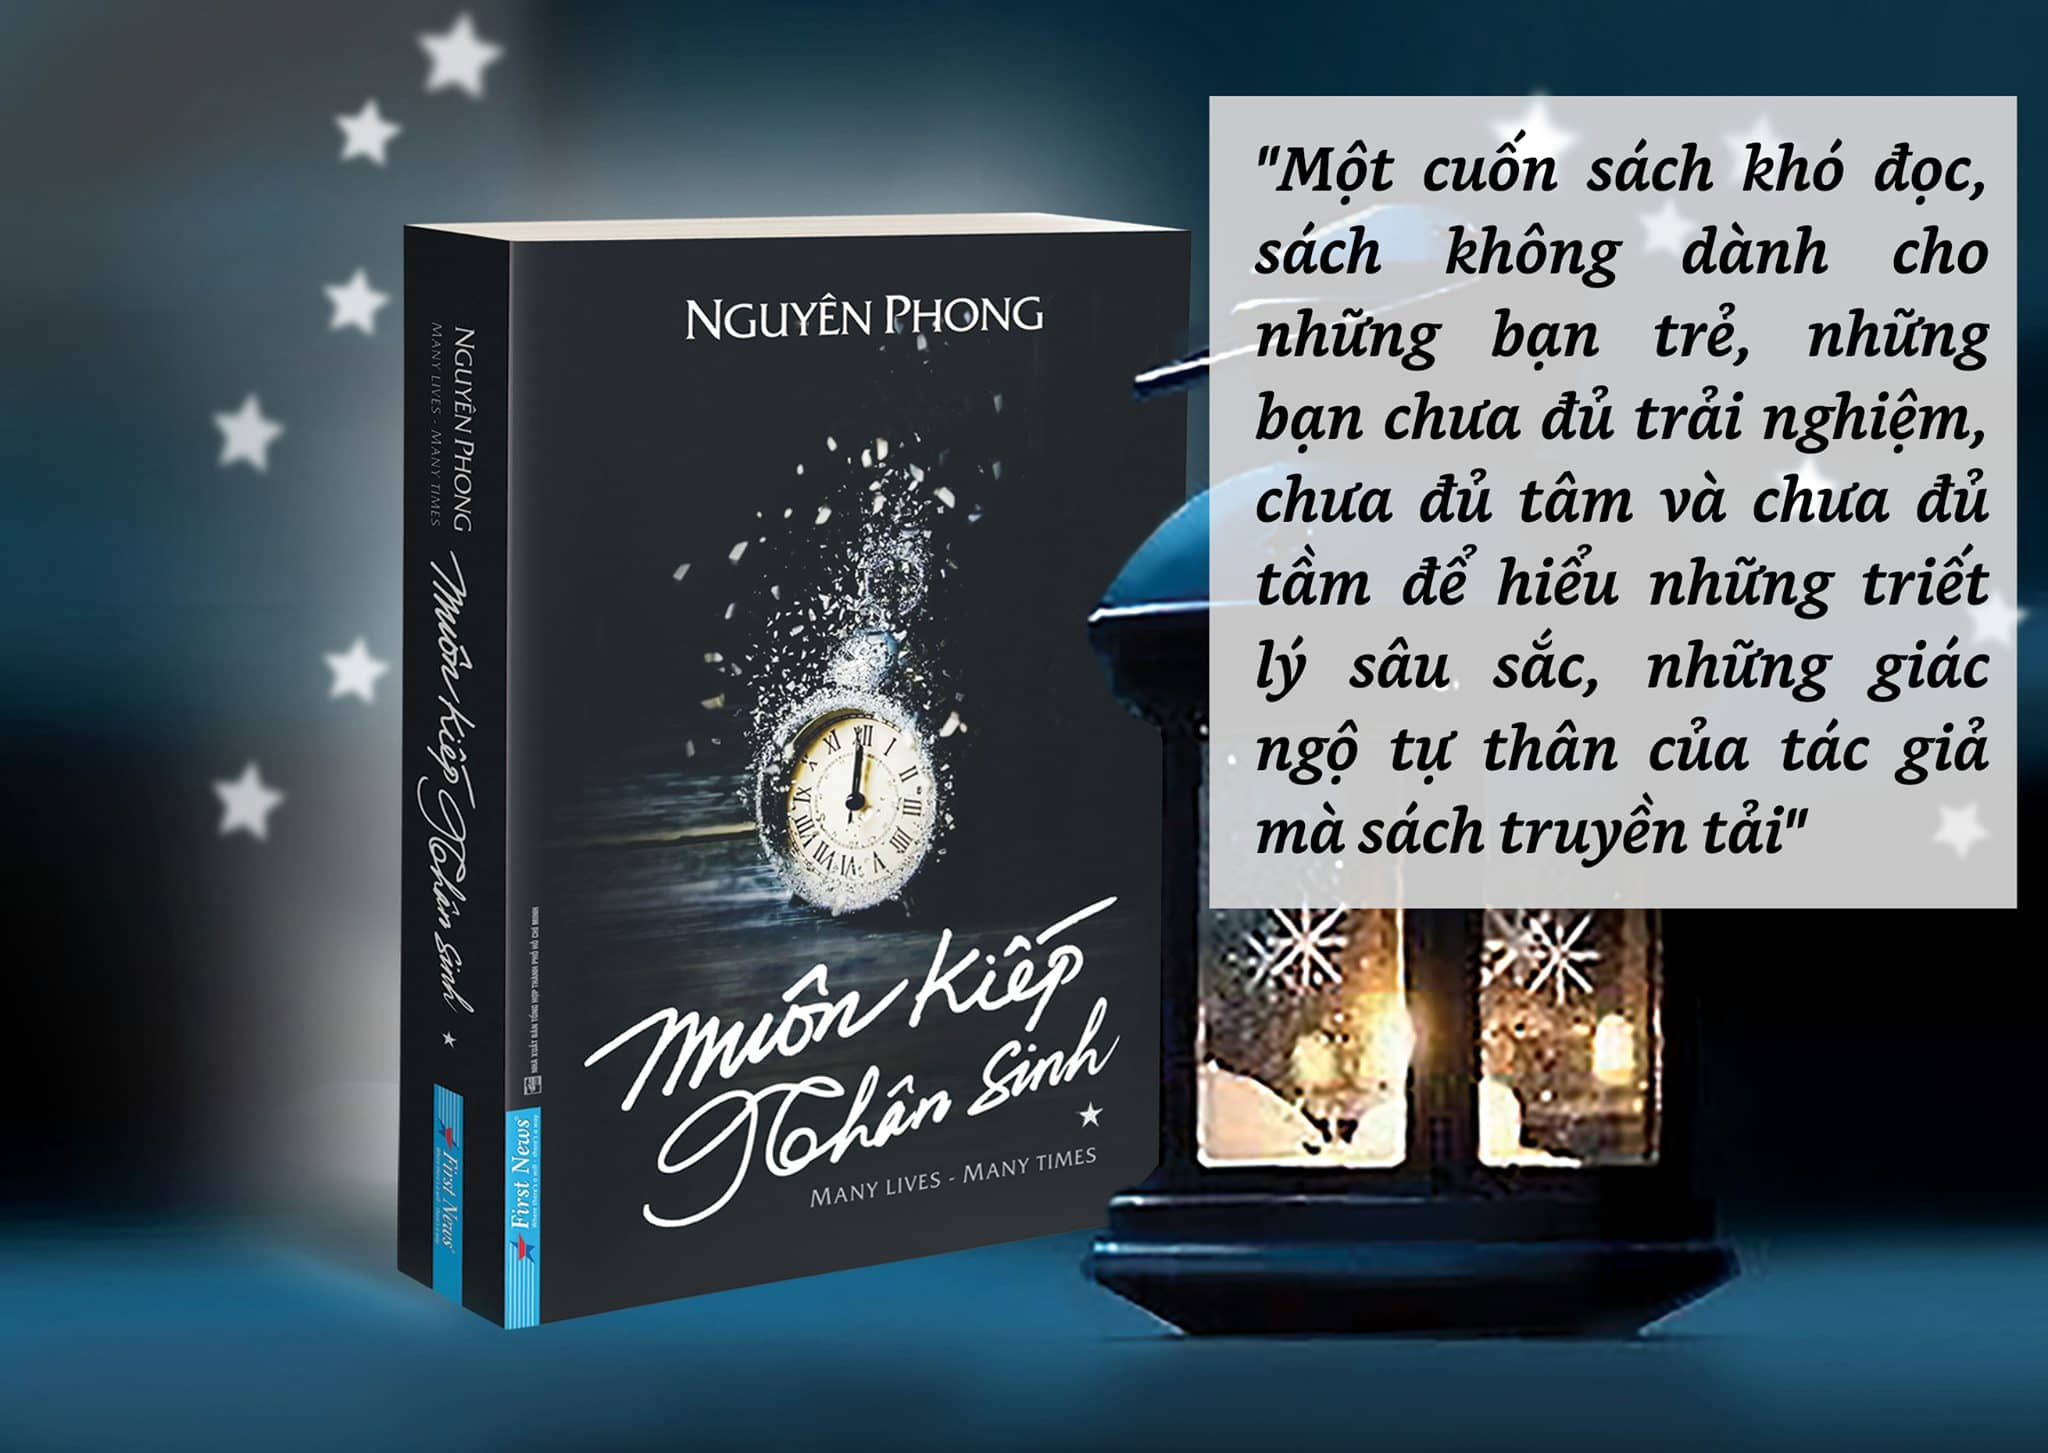 muon kiep nhan sinh review